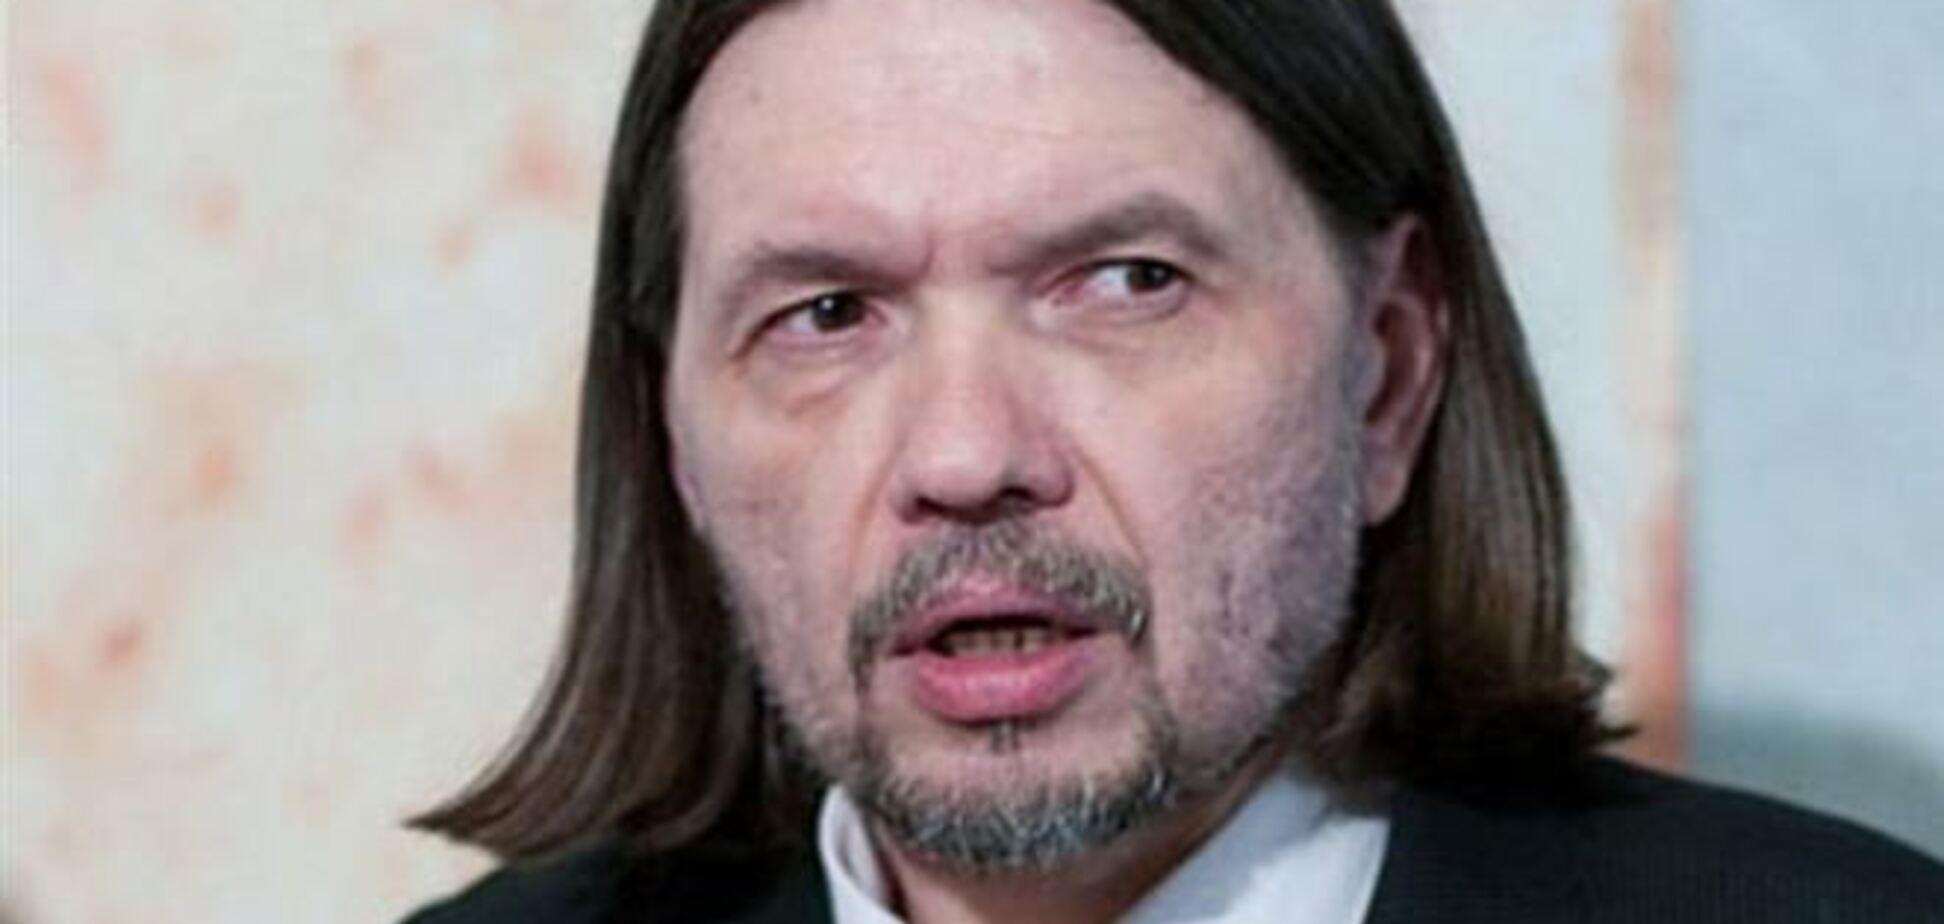 В Васильковском районе идет 'охота' на избирателей, - Бригинец